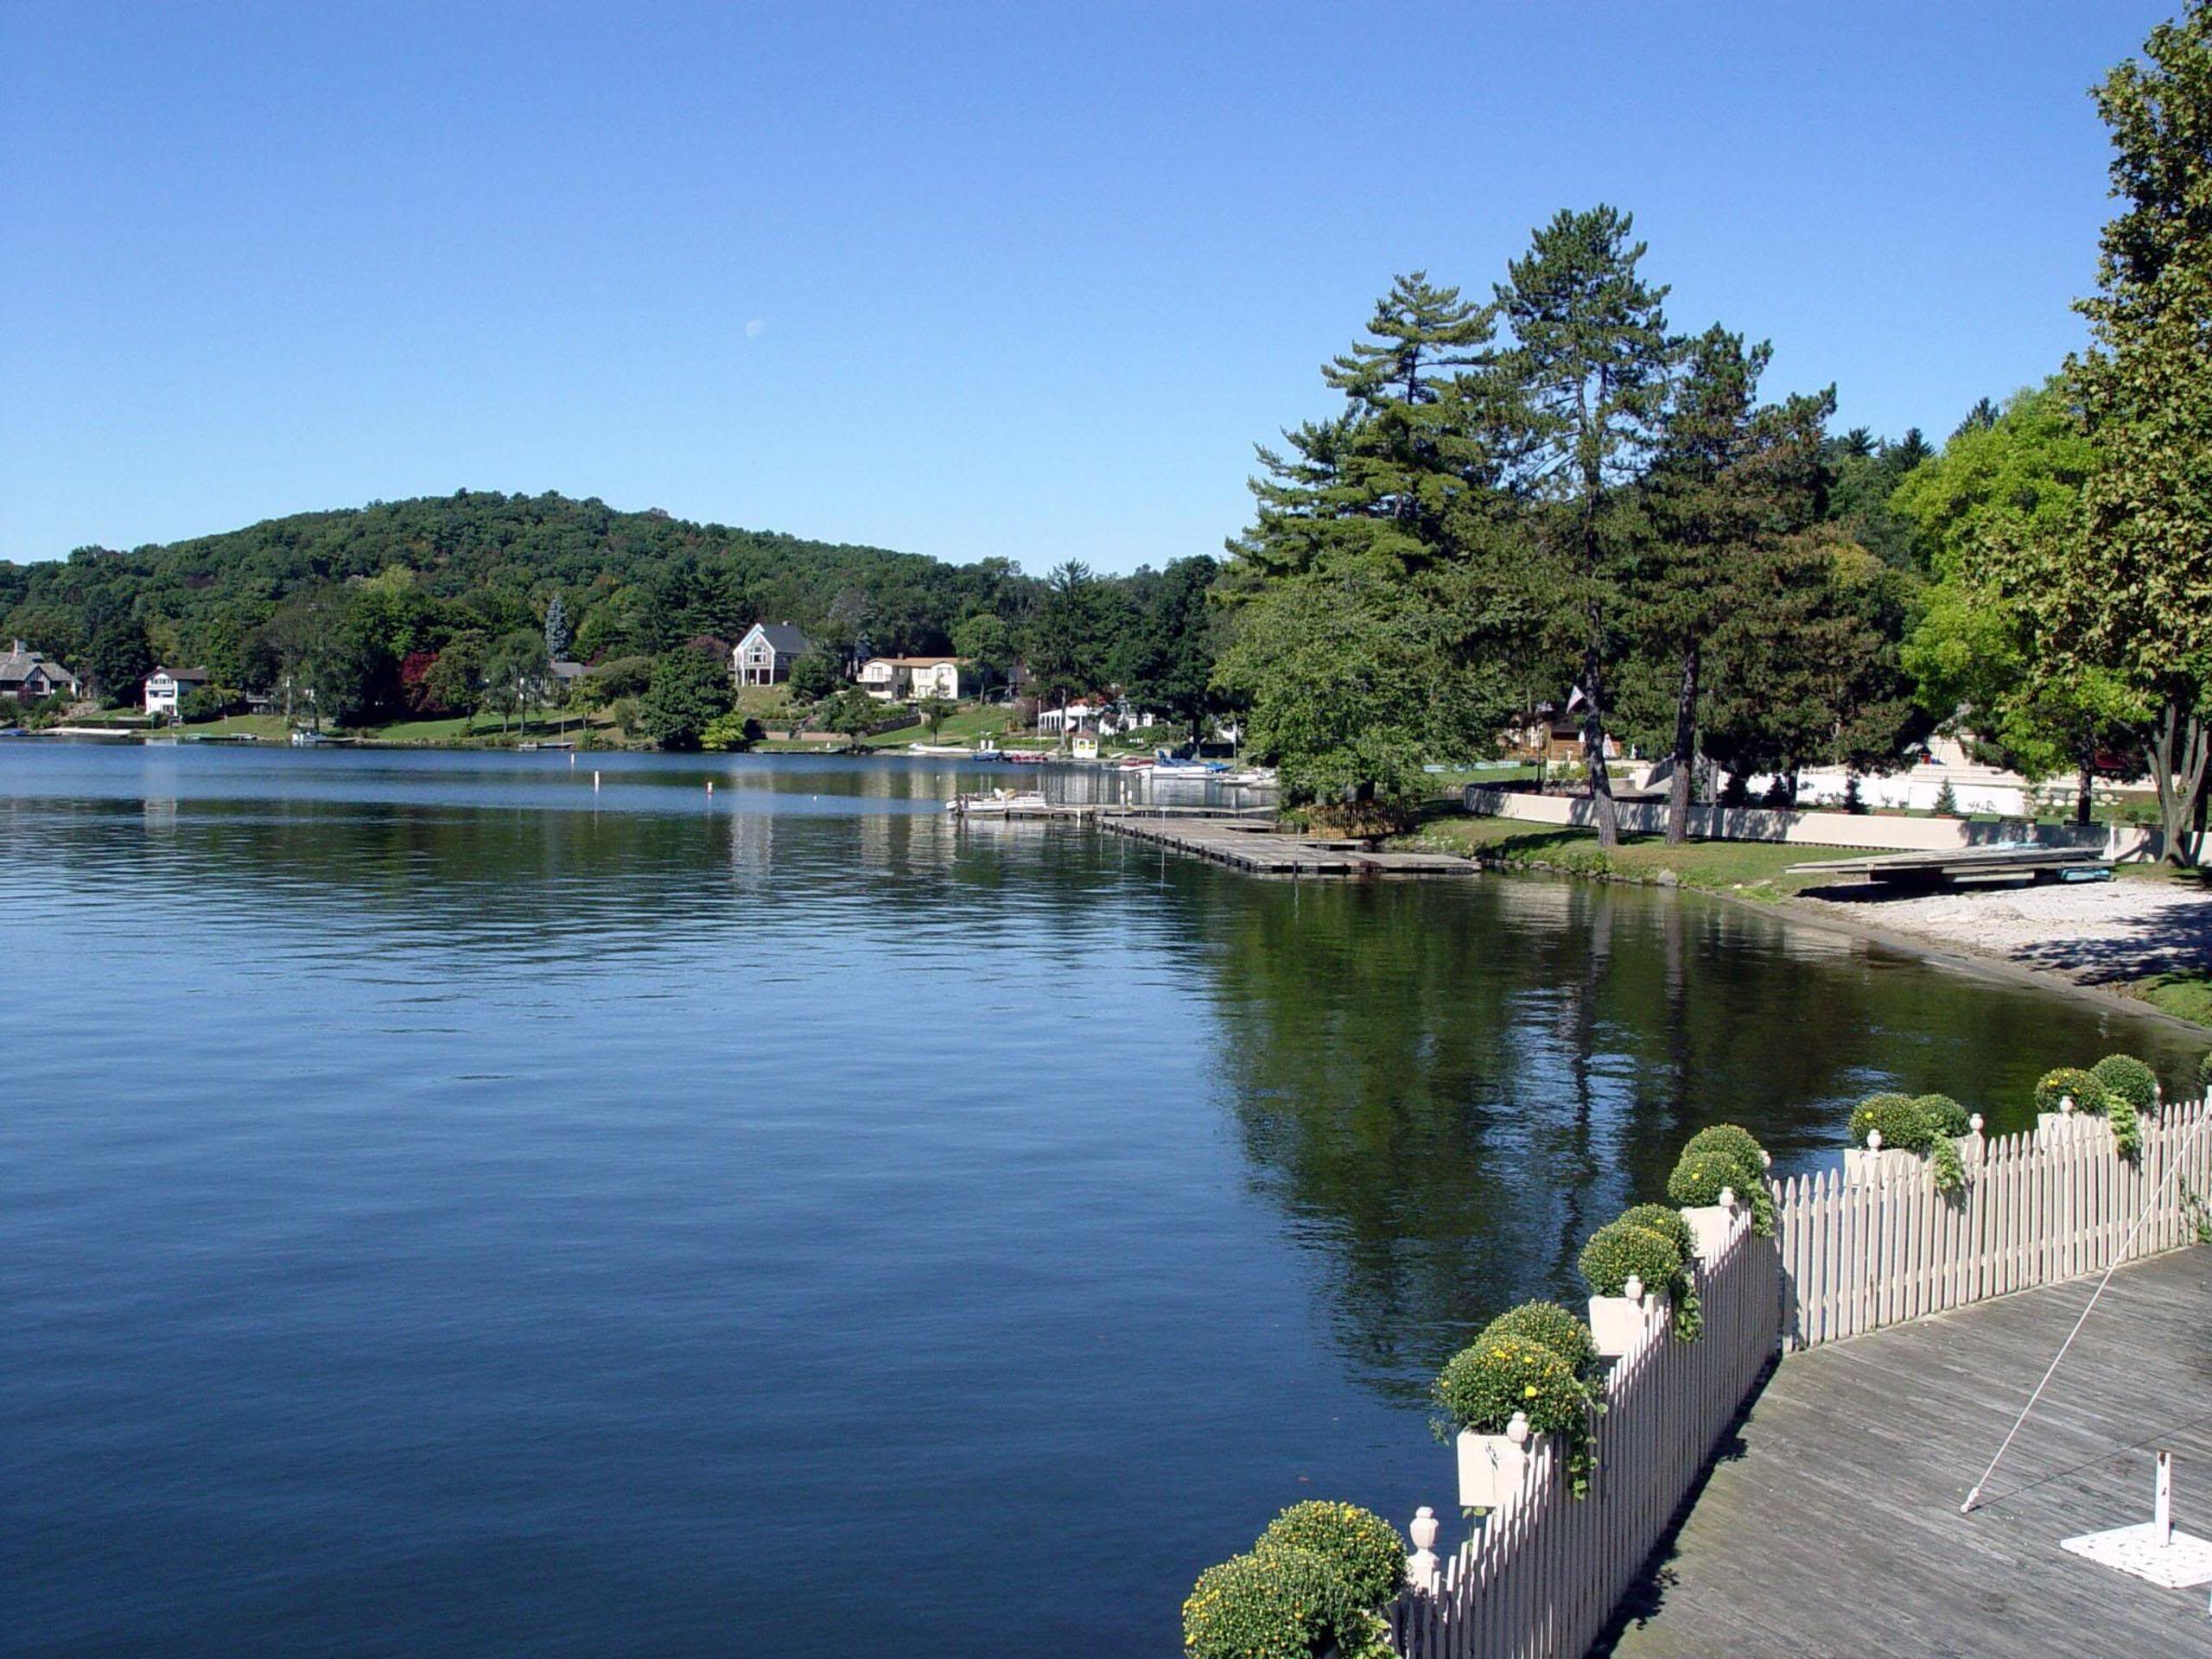 Lake Mohawk